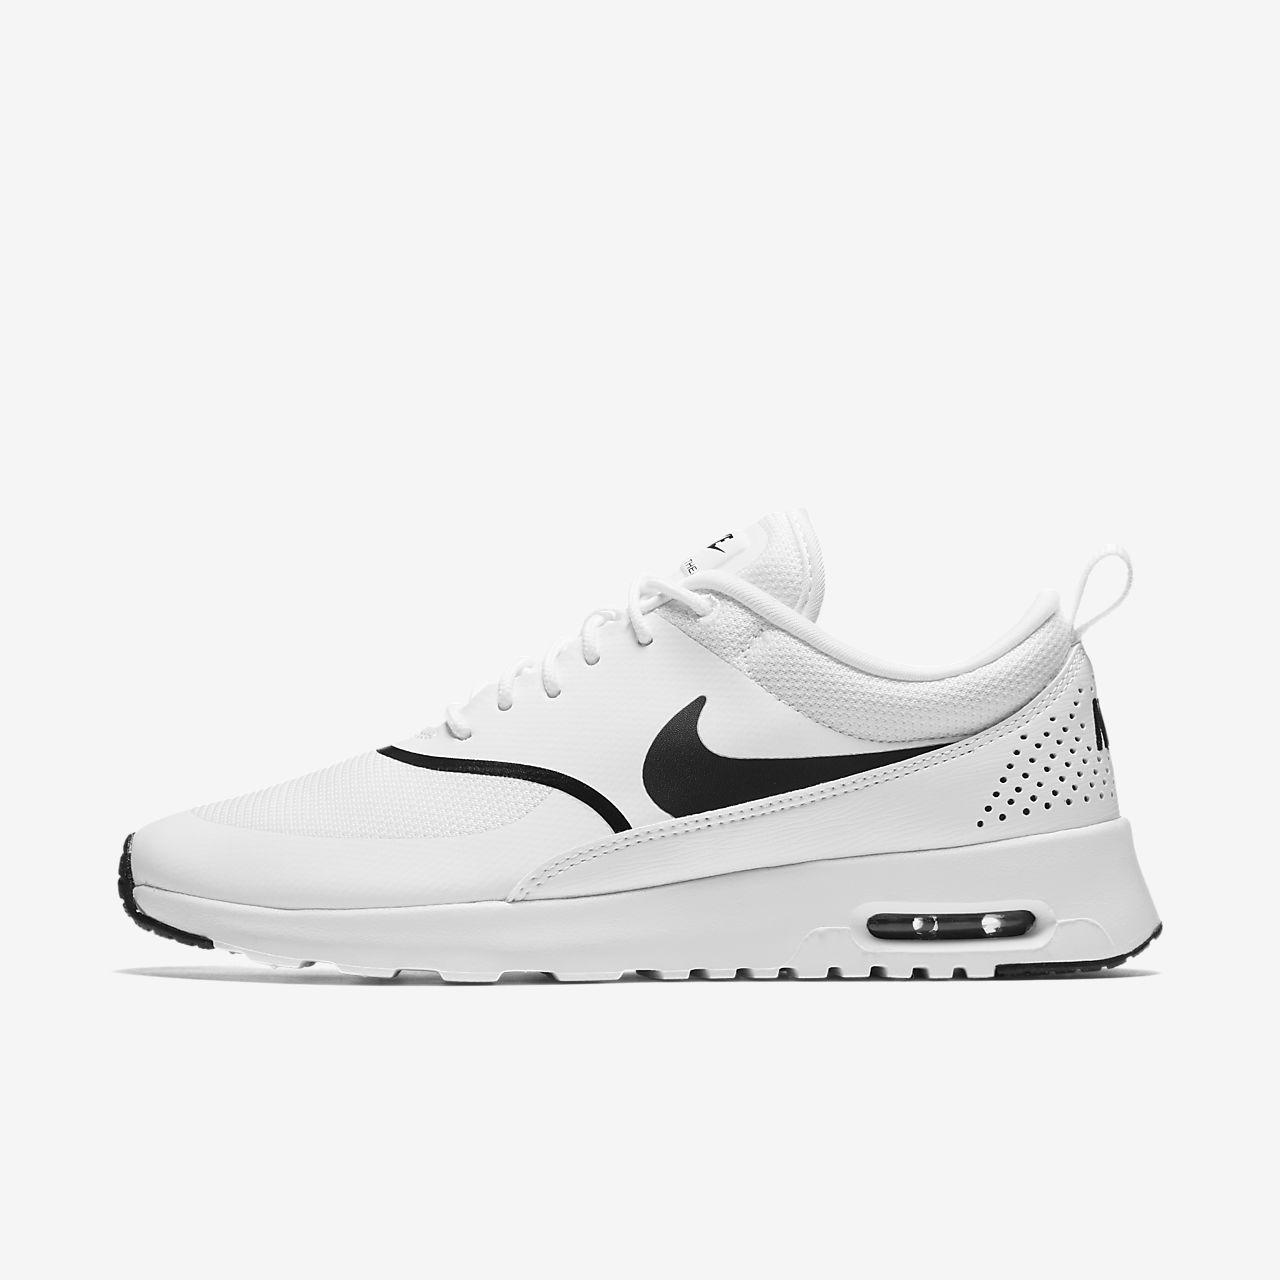 online store d25fd 814c8 Low Resolution Calzado para mujer Nike Air Max Thea Calzado para mujer Nike  Air Max Thea